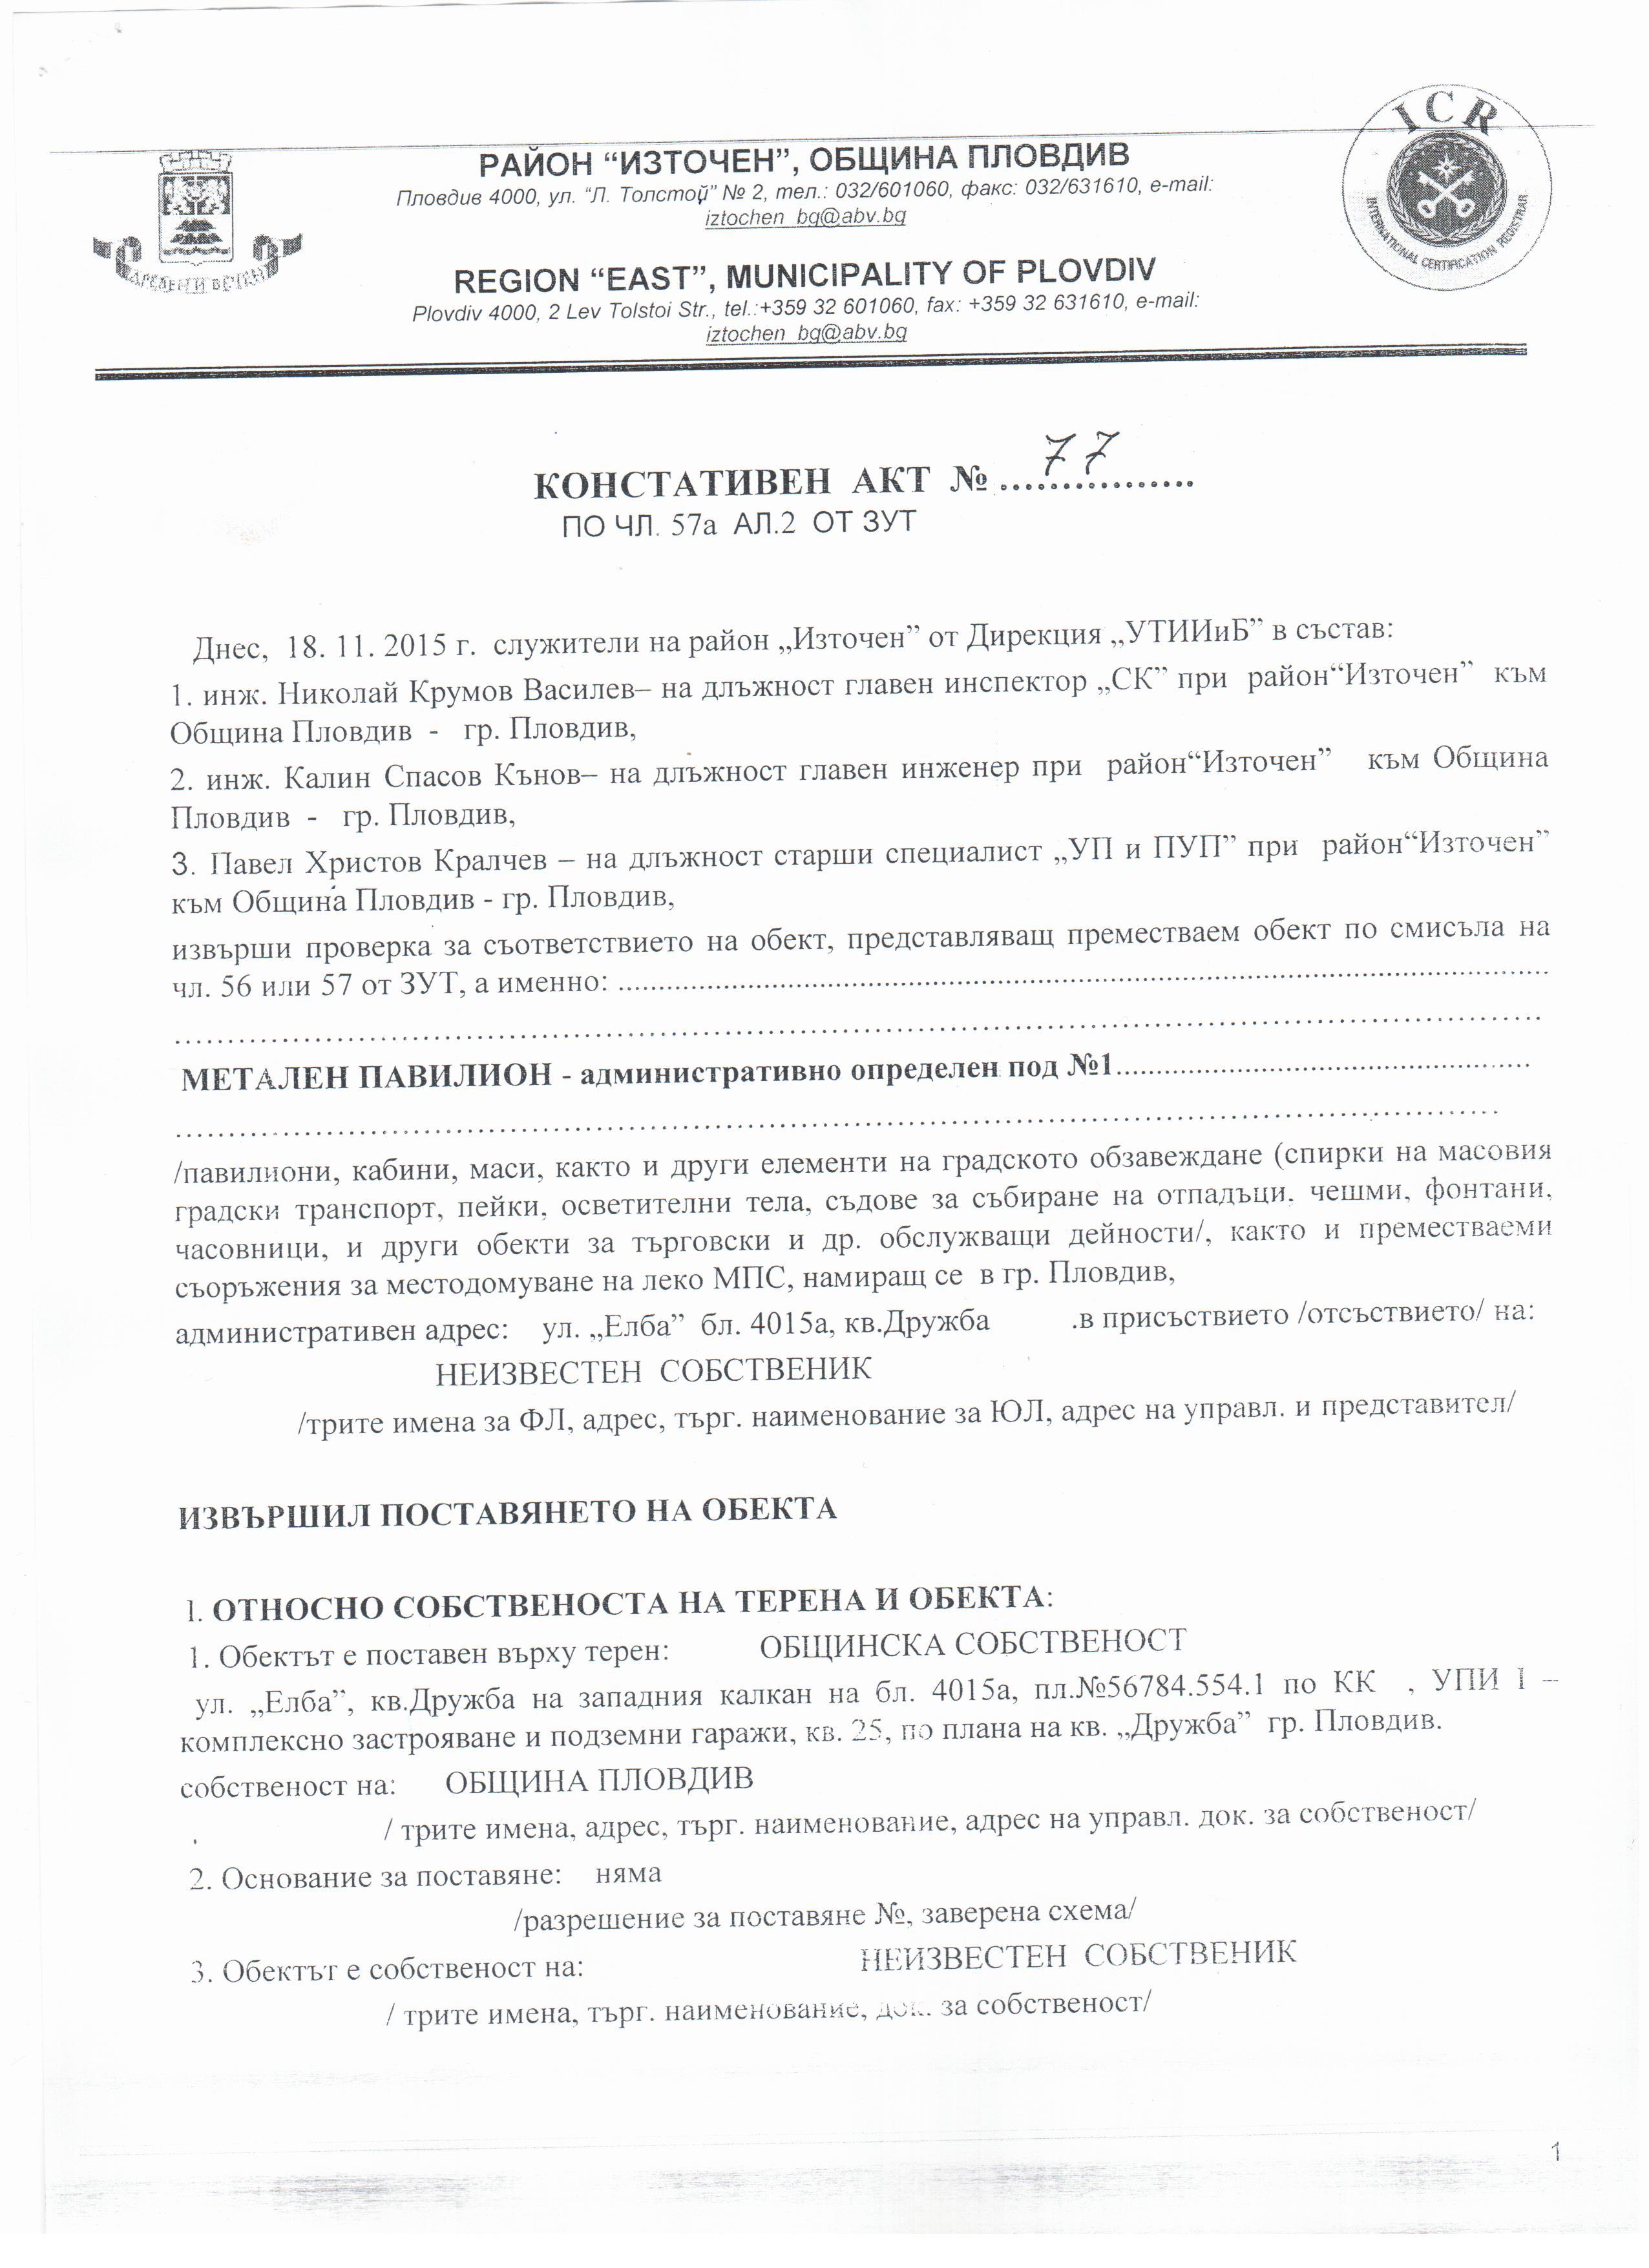 KONSTATIVEN_AKT_№77